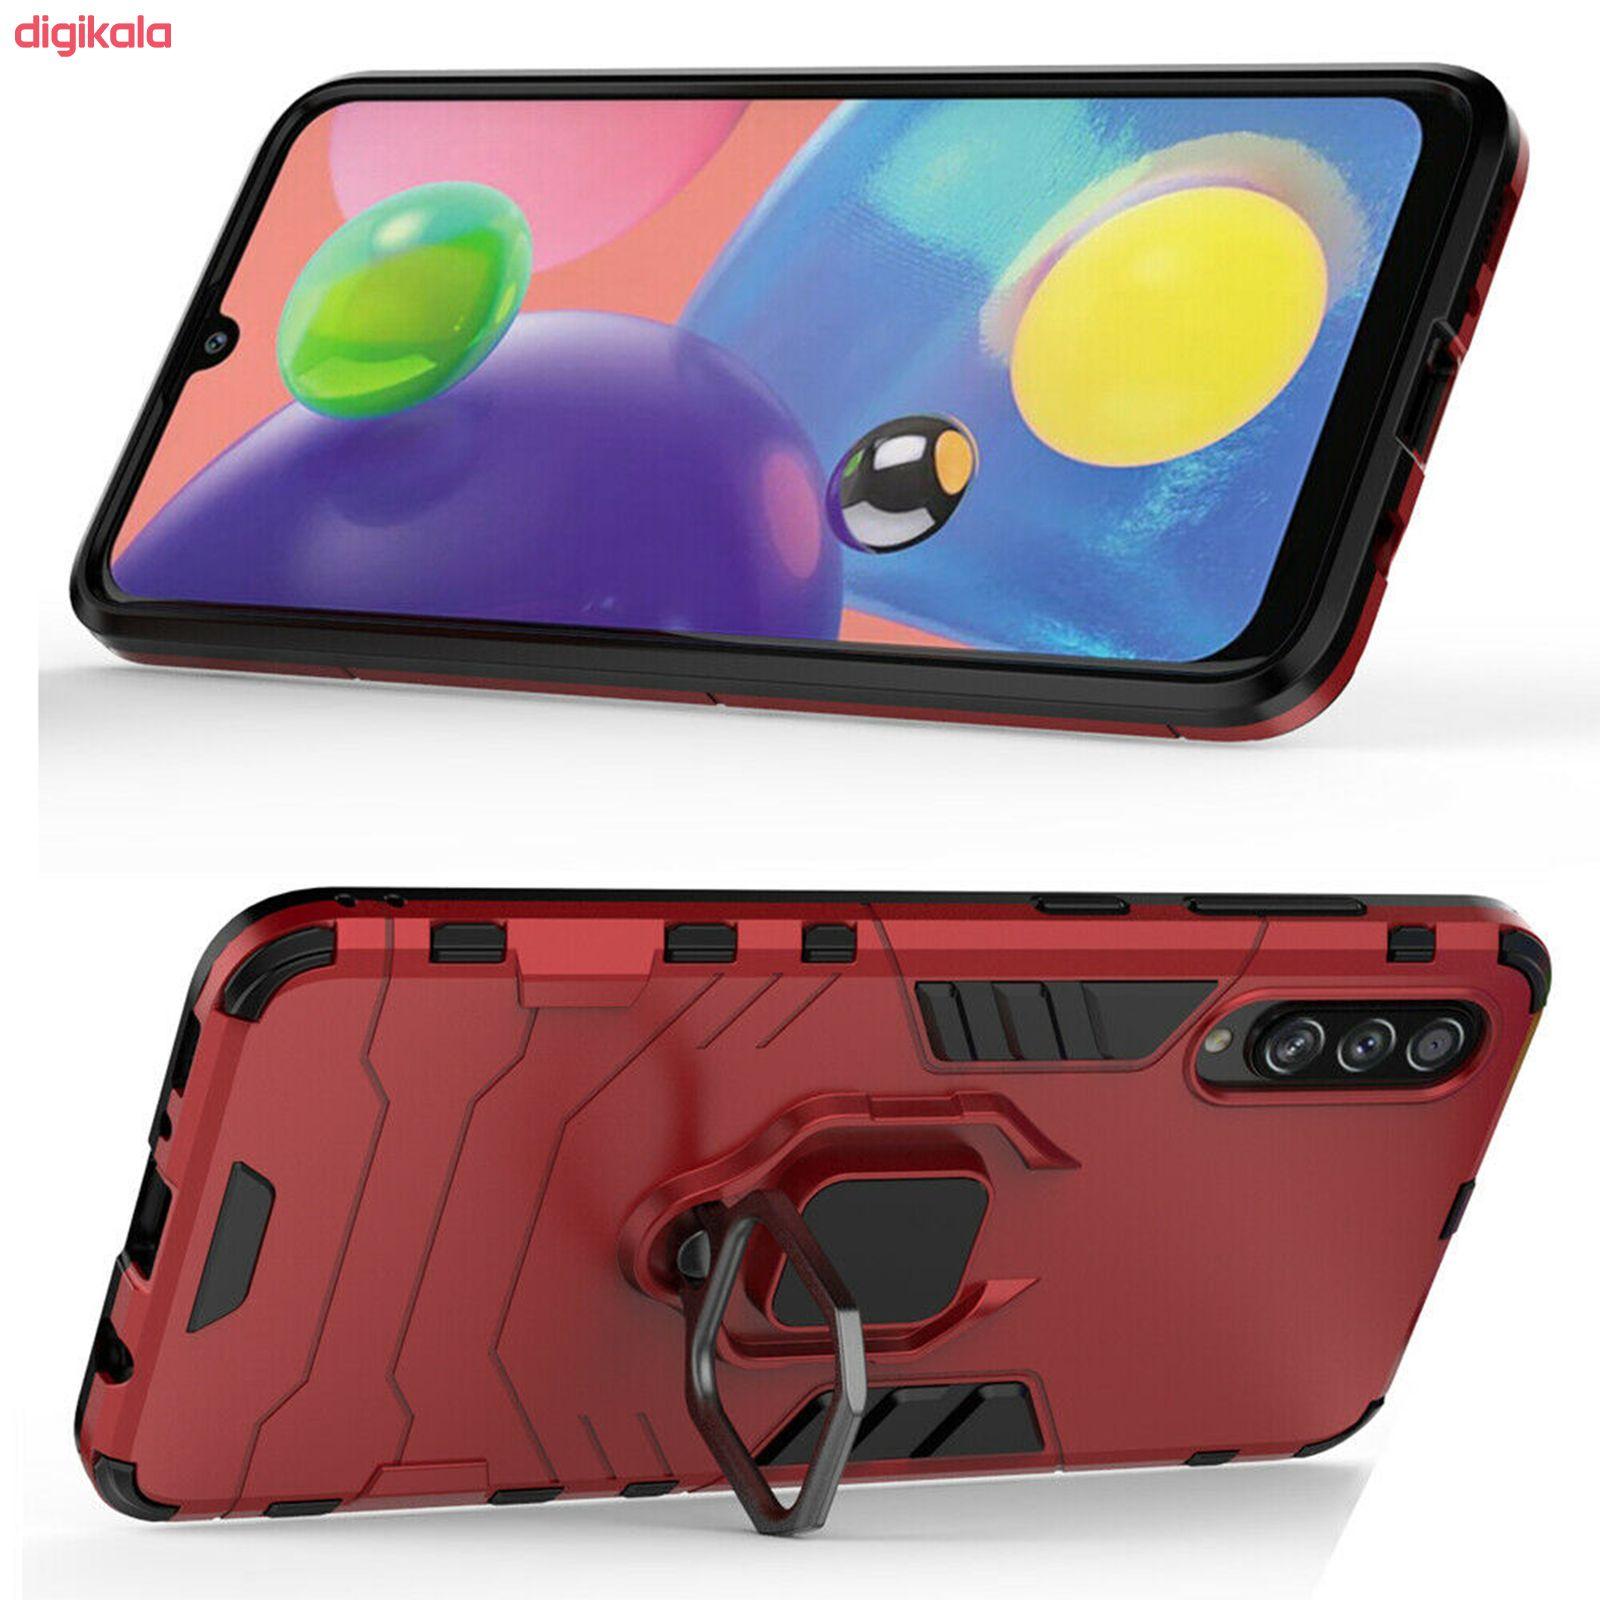 کاور کانواس مدل RHINO SERIES مناسب برای گوشی موبایل سامسونگ Galaxy A50s/A30s/A50 main 1 12